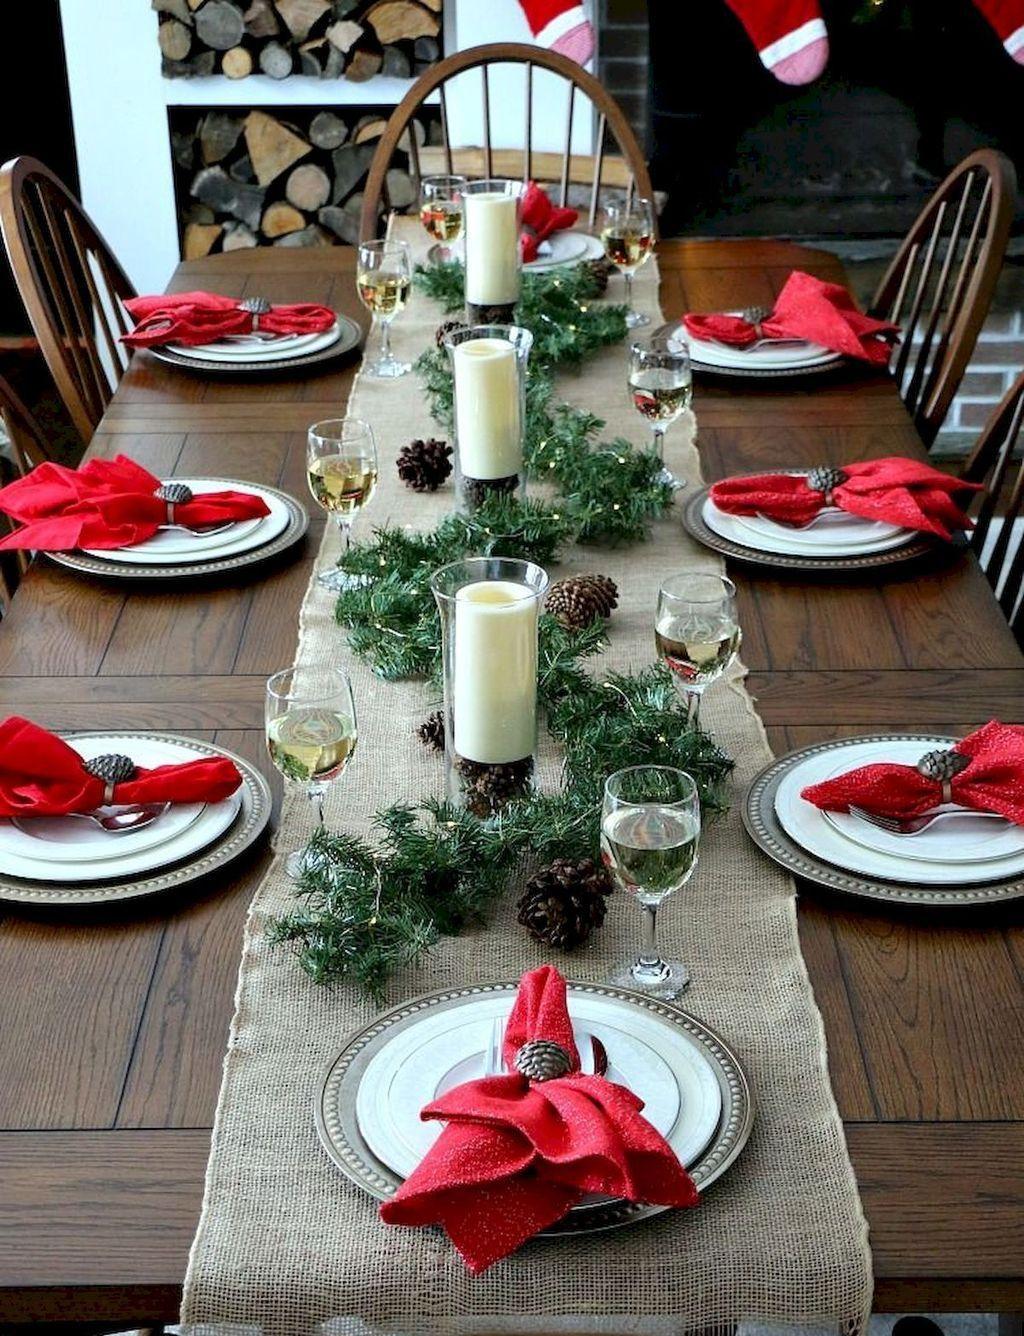 83 Diy Christmas Decor Ideas For The Home Christmas Table Centerpieces